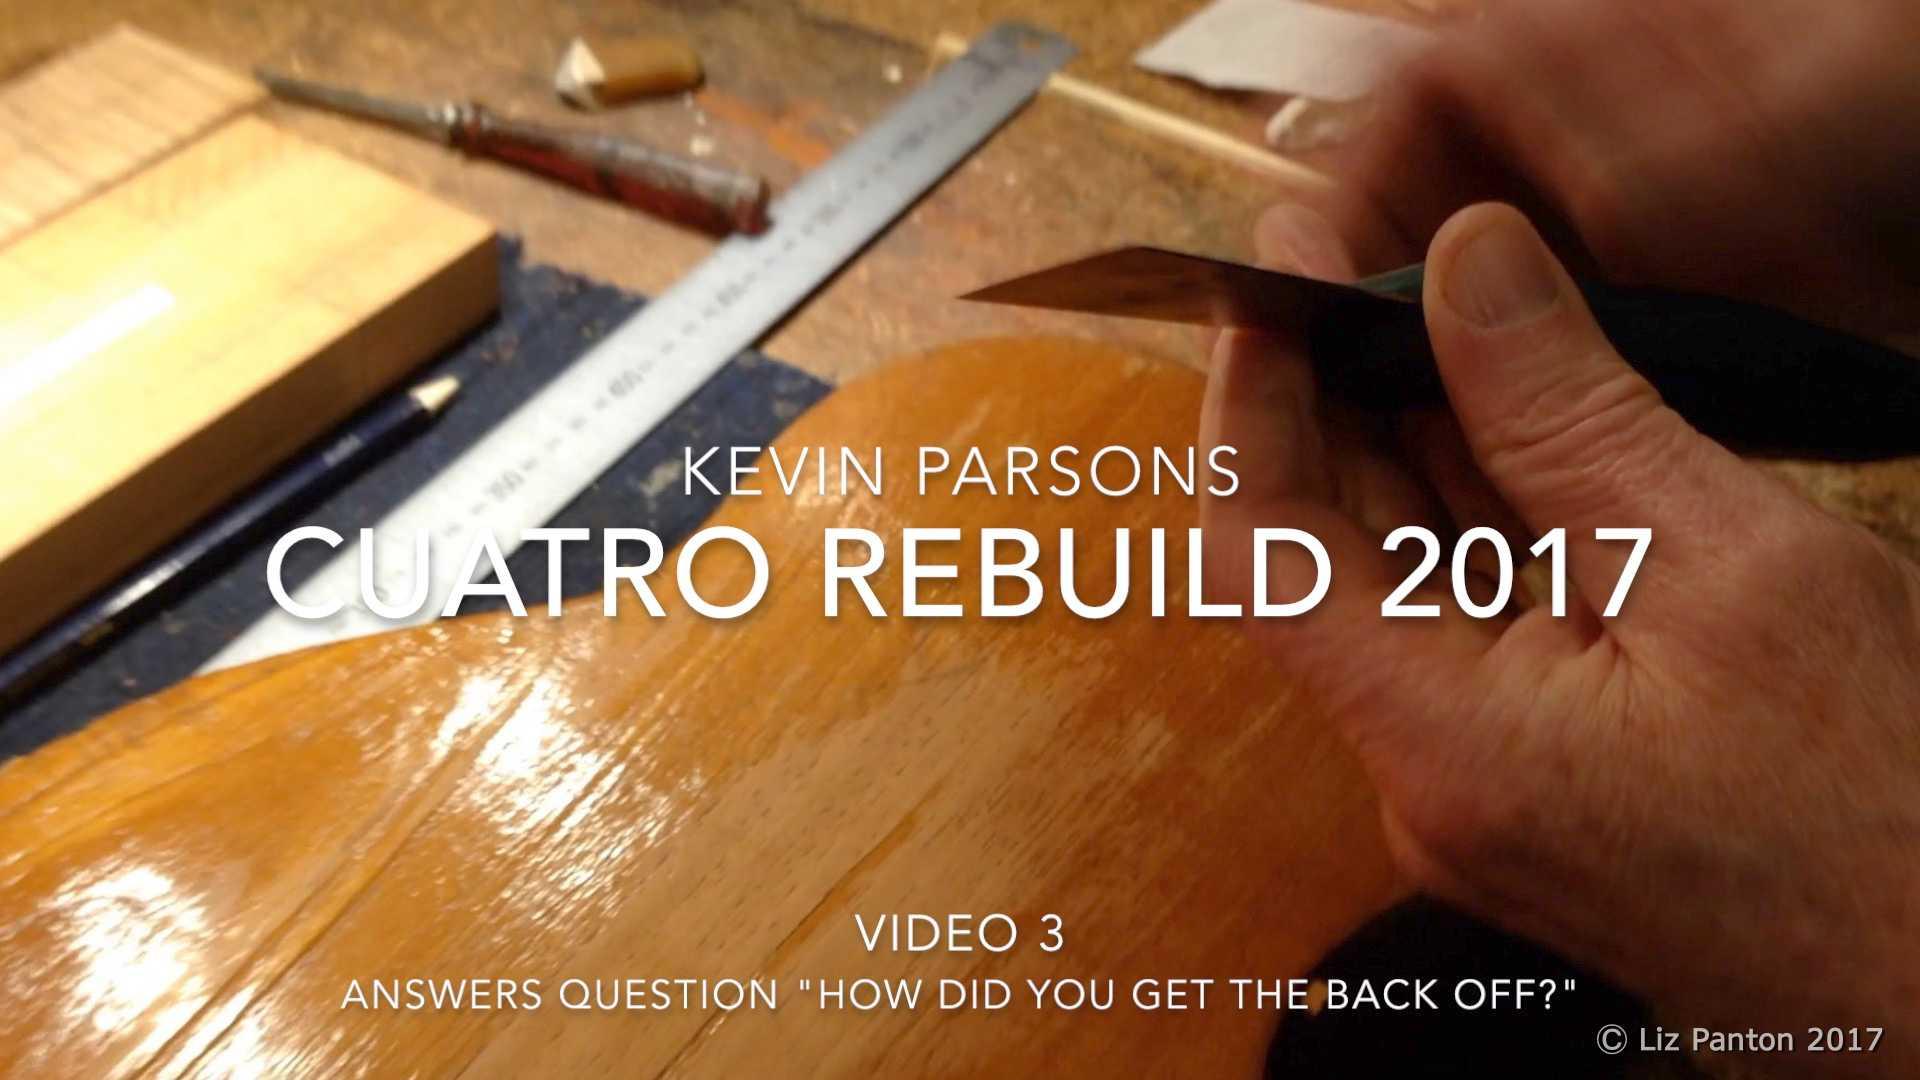 Venezuelan Cuatro Rebuild by Kevin Parsons – Part 3